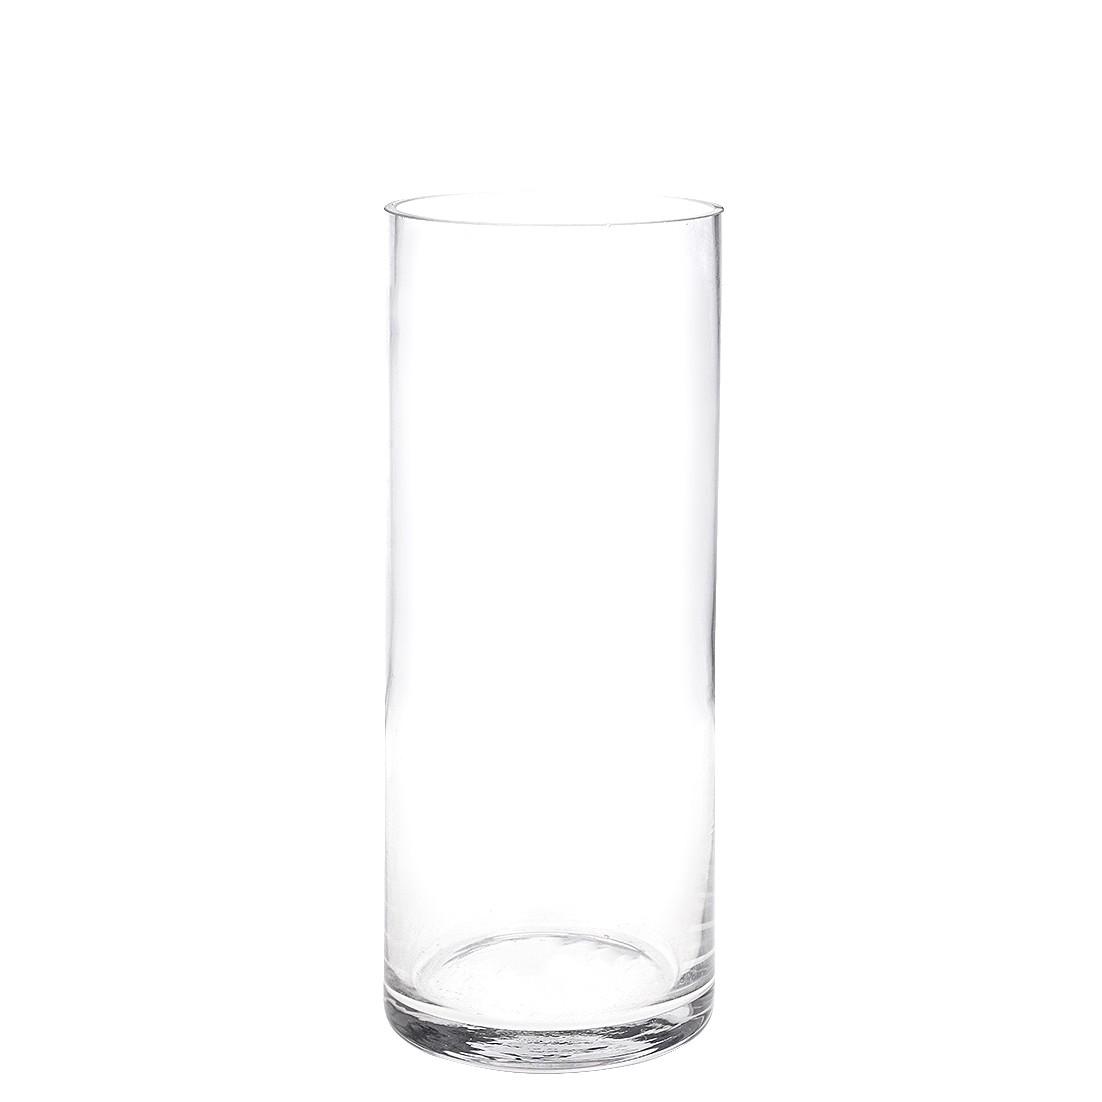 Vaso Decorativo de Vidro 25 cm Redondo Transparente - GPresentes